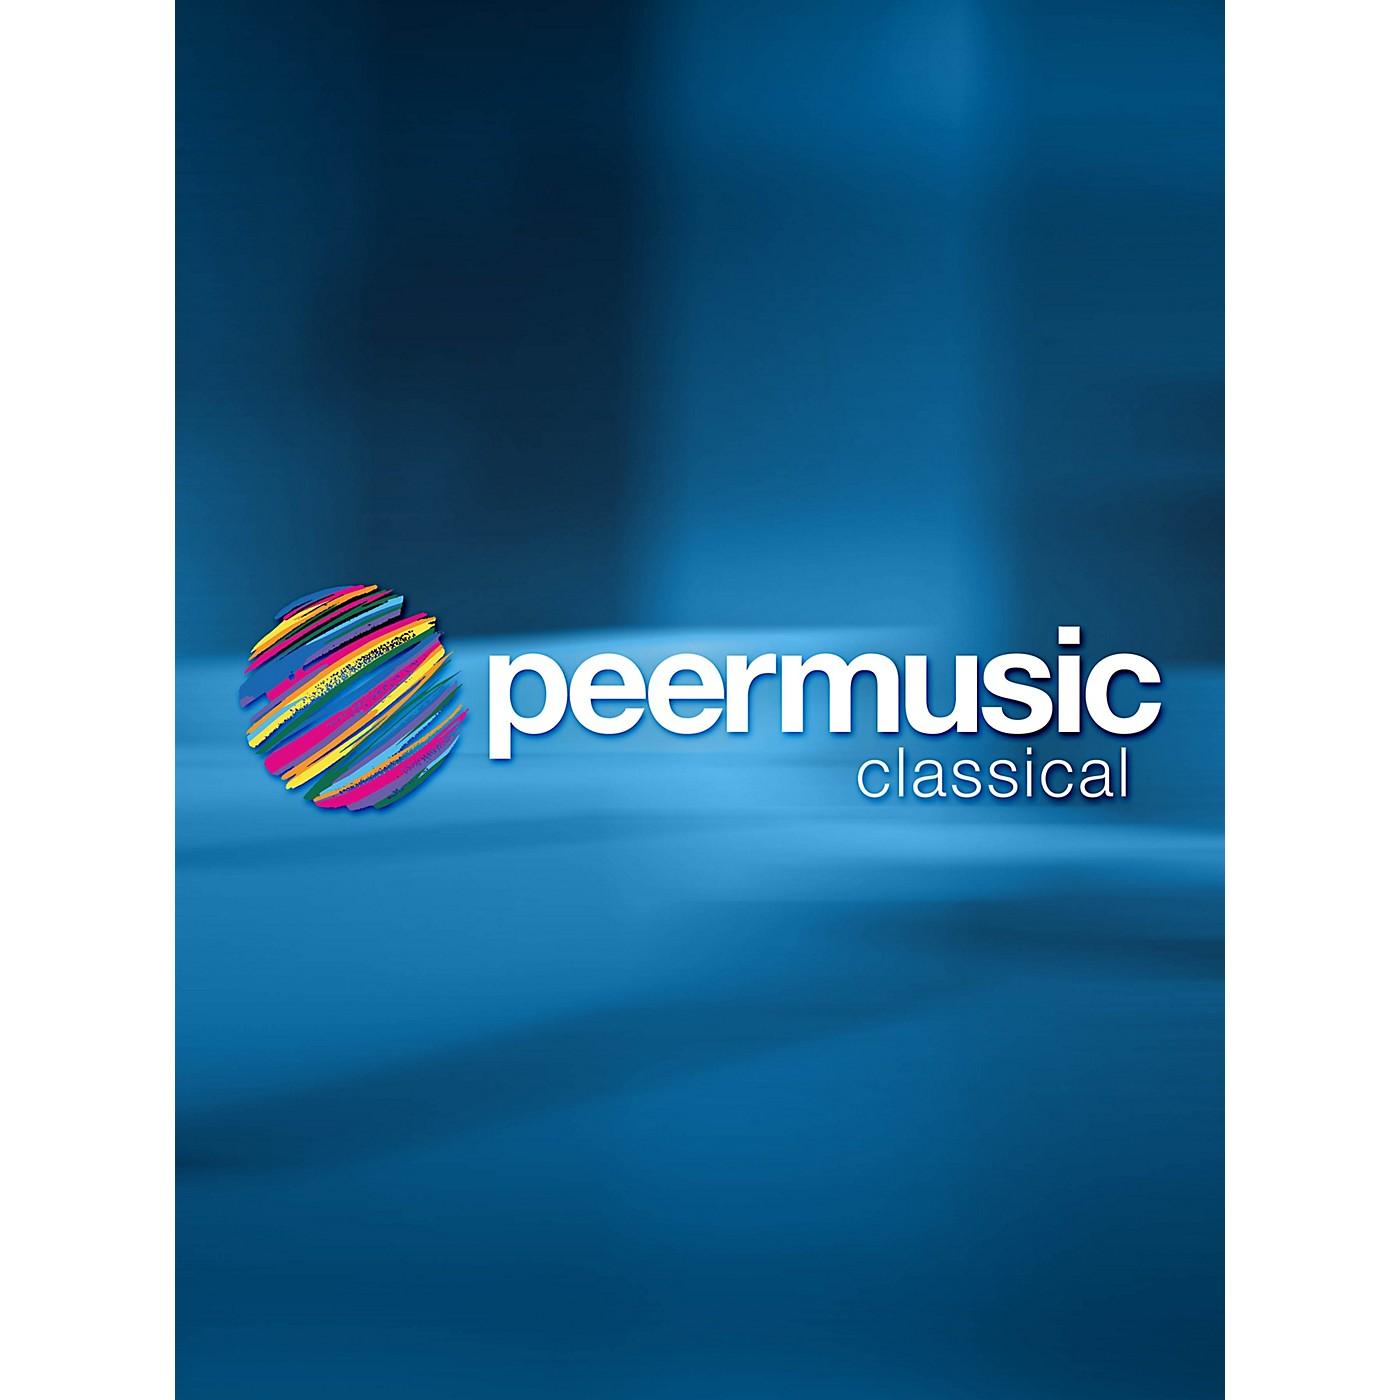 Peer Music Escolio (Piano Solo) Peermusic Classical Series Softcover thumbnail